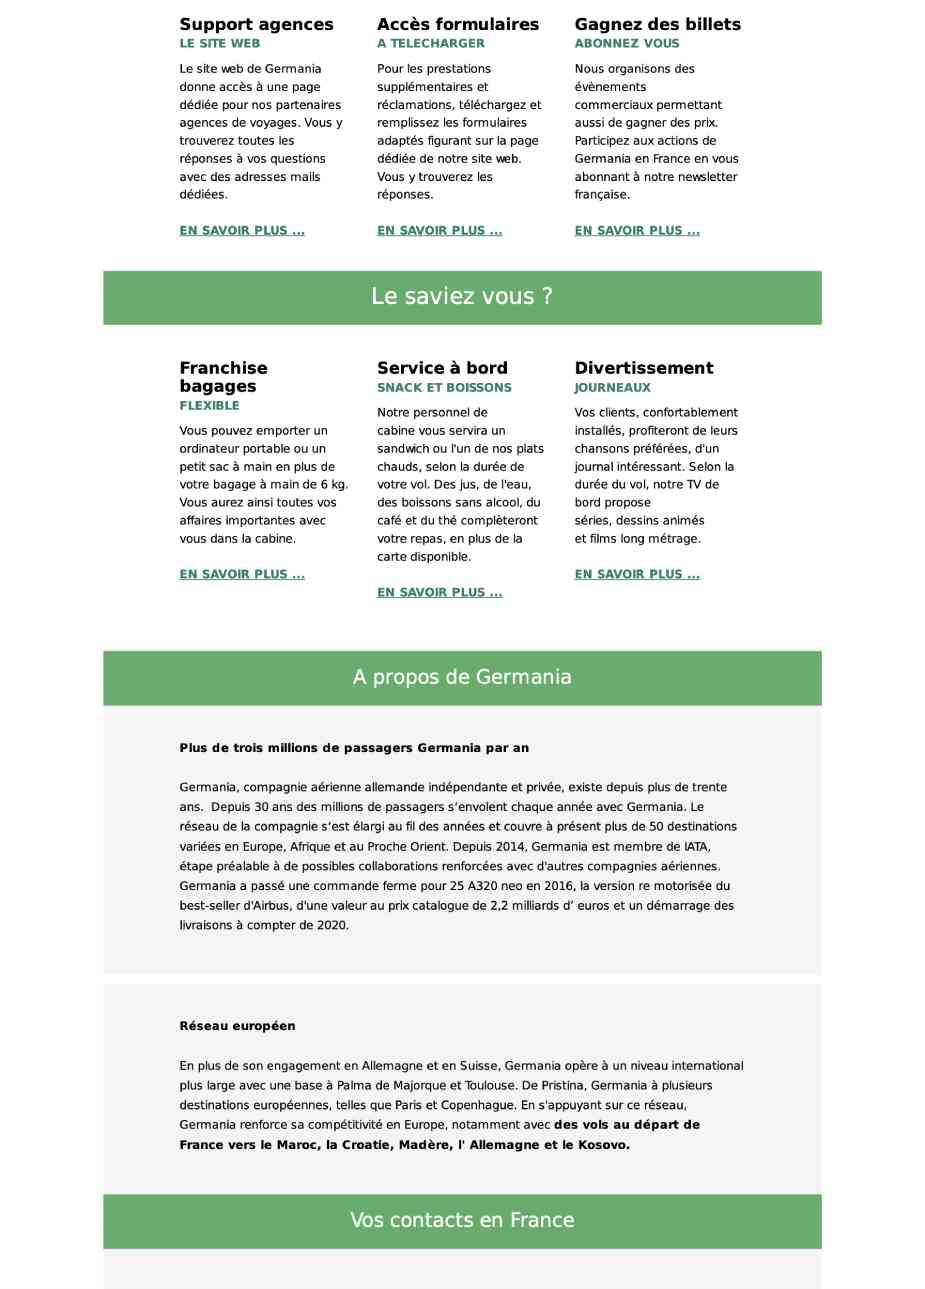 germania-zone-web-promotion-web